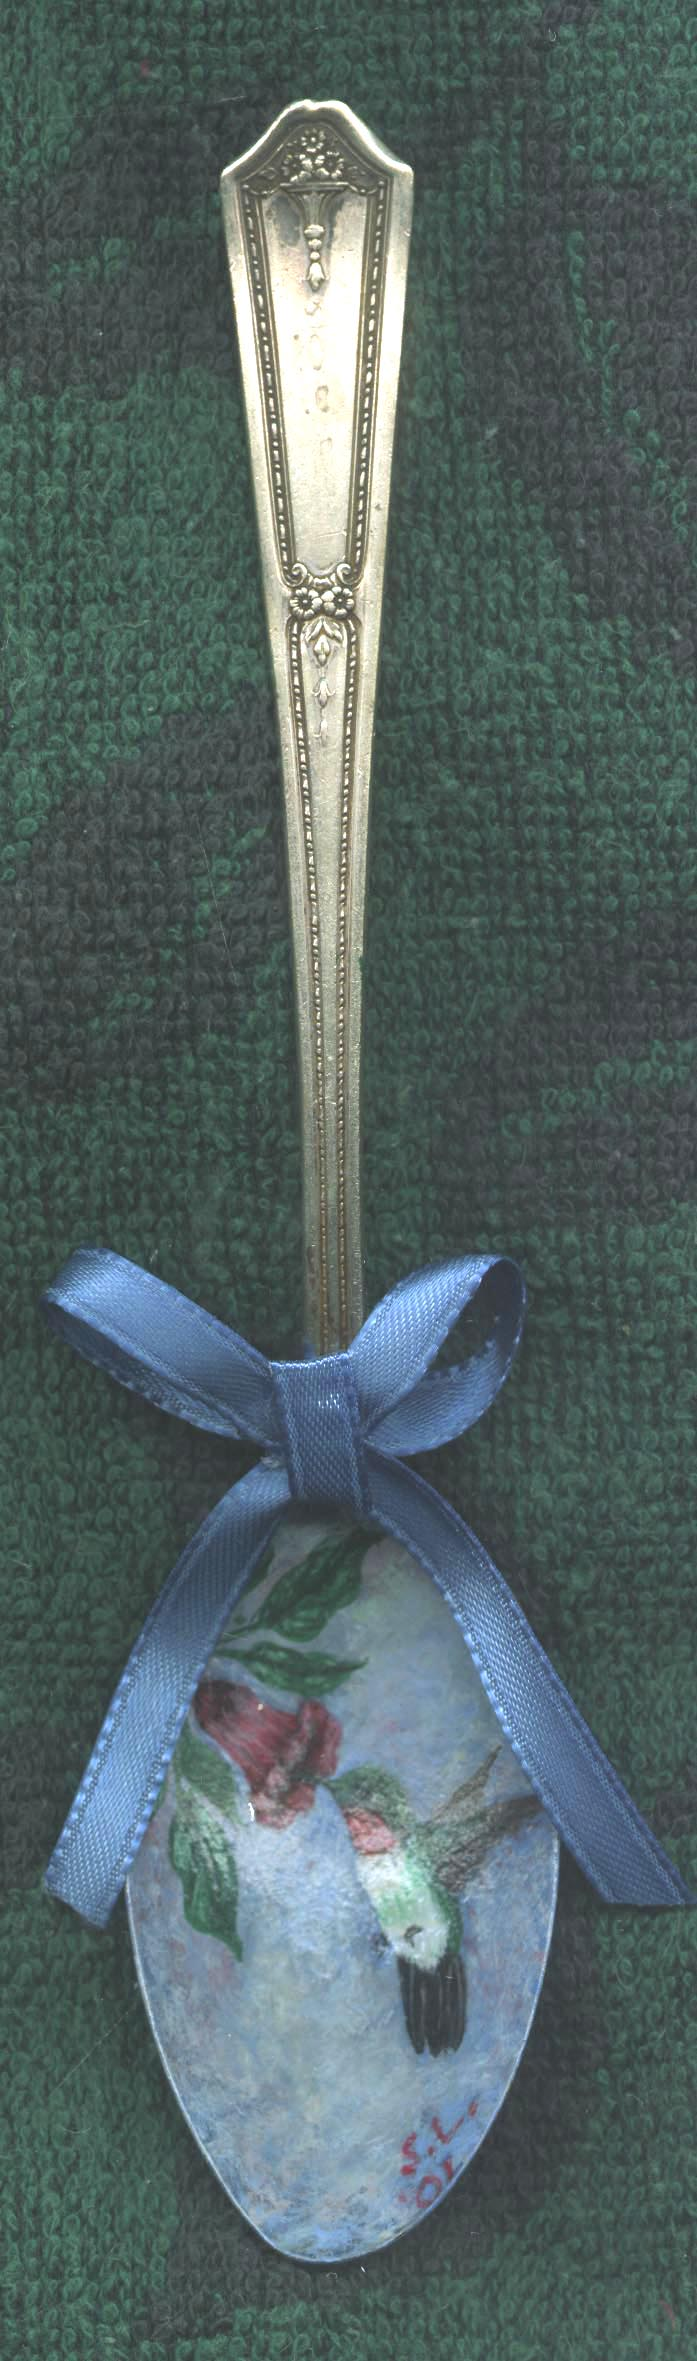 hummingspoonwithribbon-1.jpg